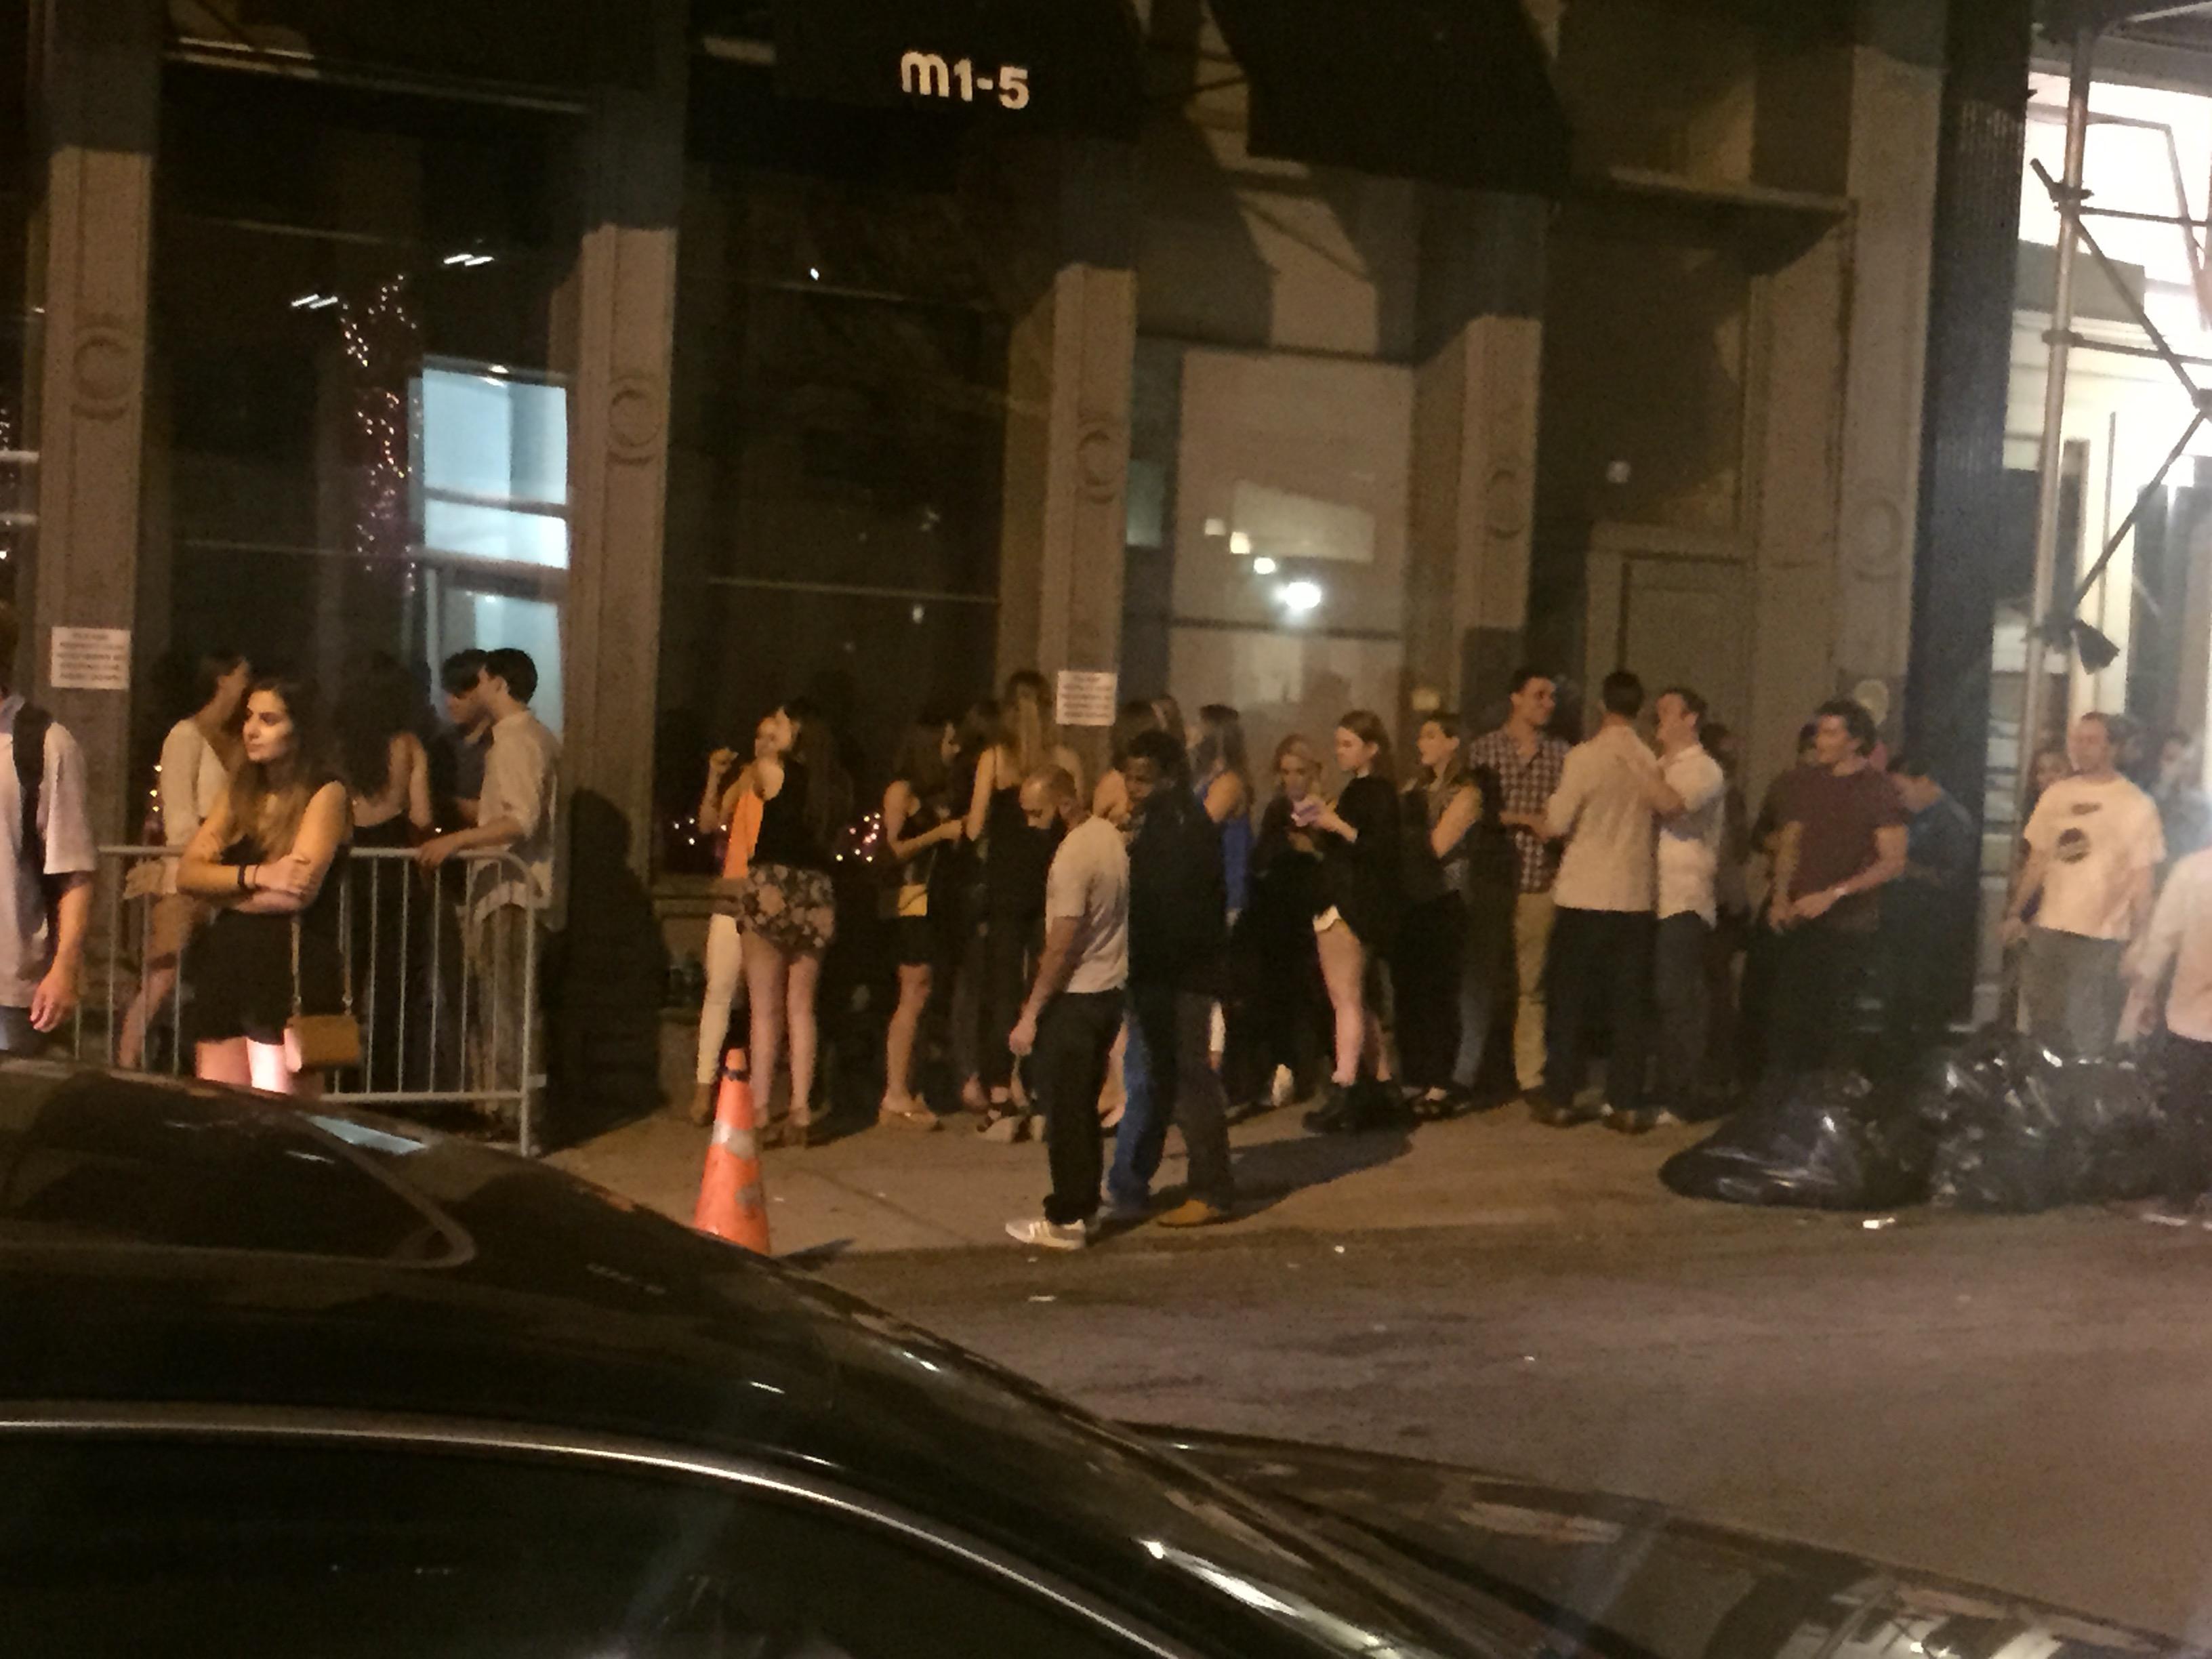 M1-5 nightclub